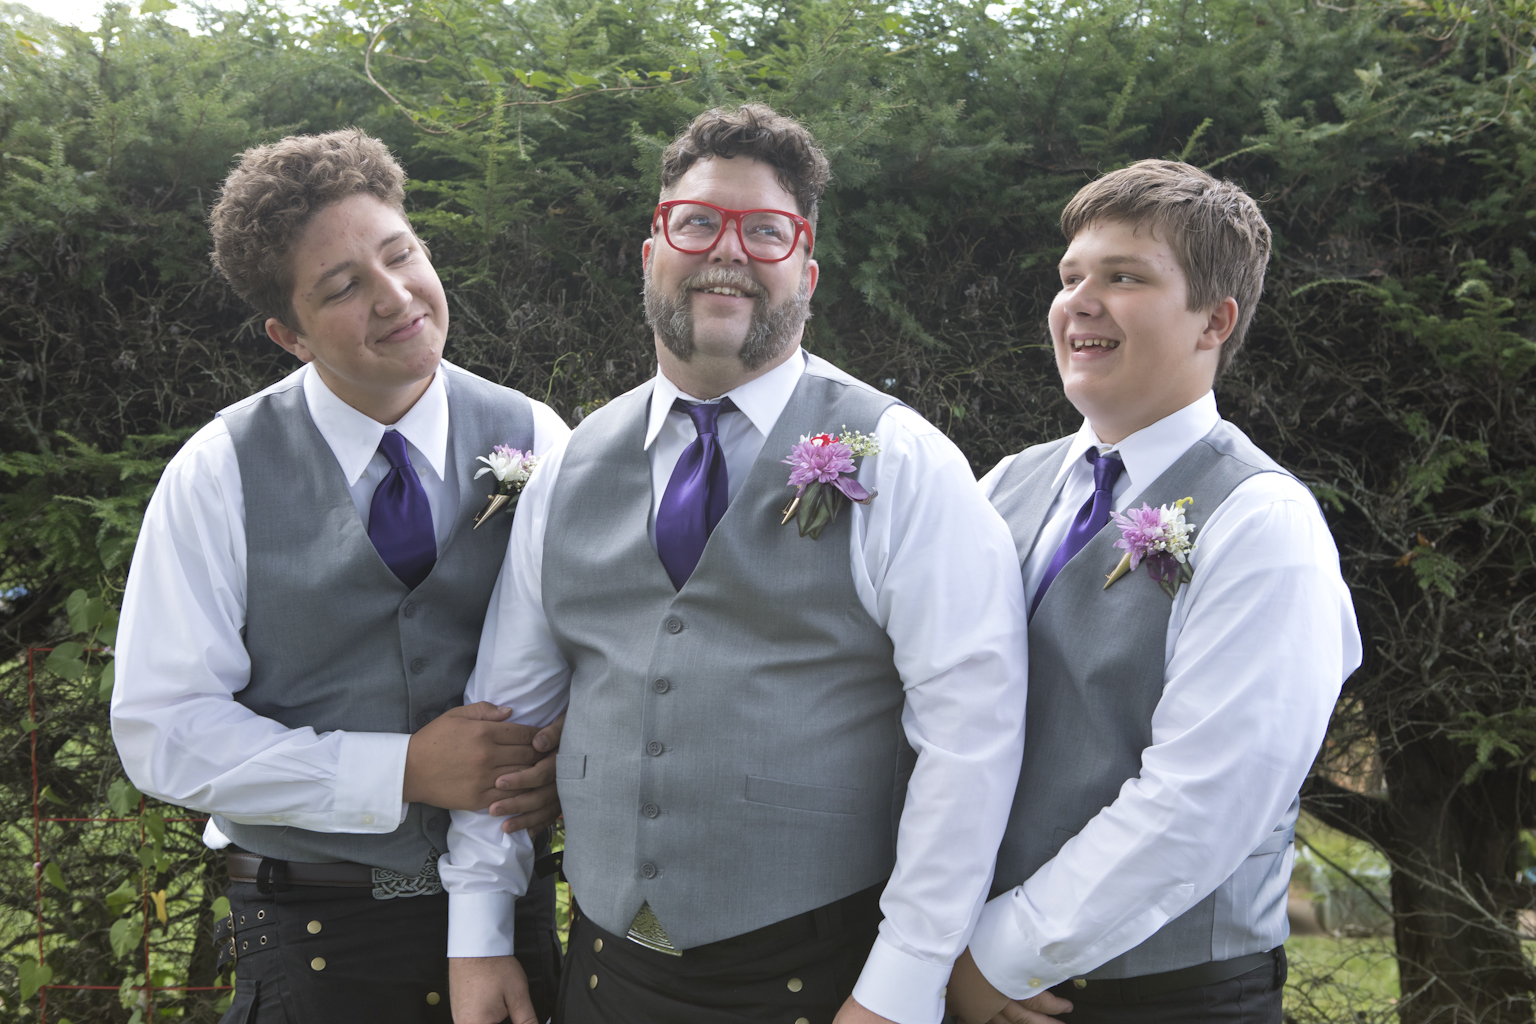 Tina and Adam wedding_Studio Misha Wedding Photography Asheville Photographer and Videographer00097.JPG